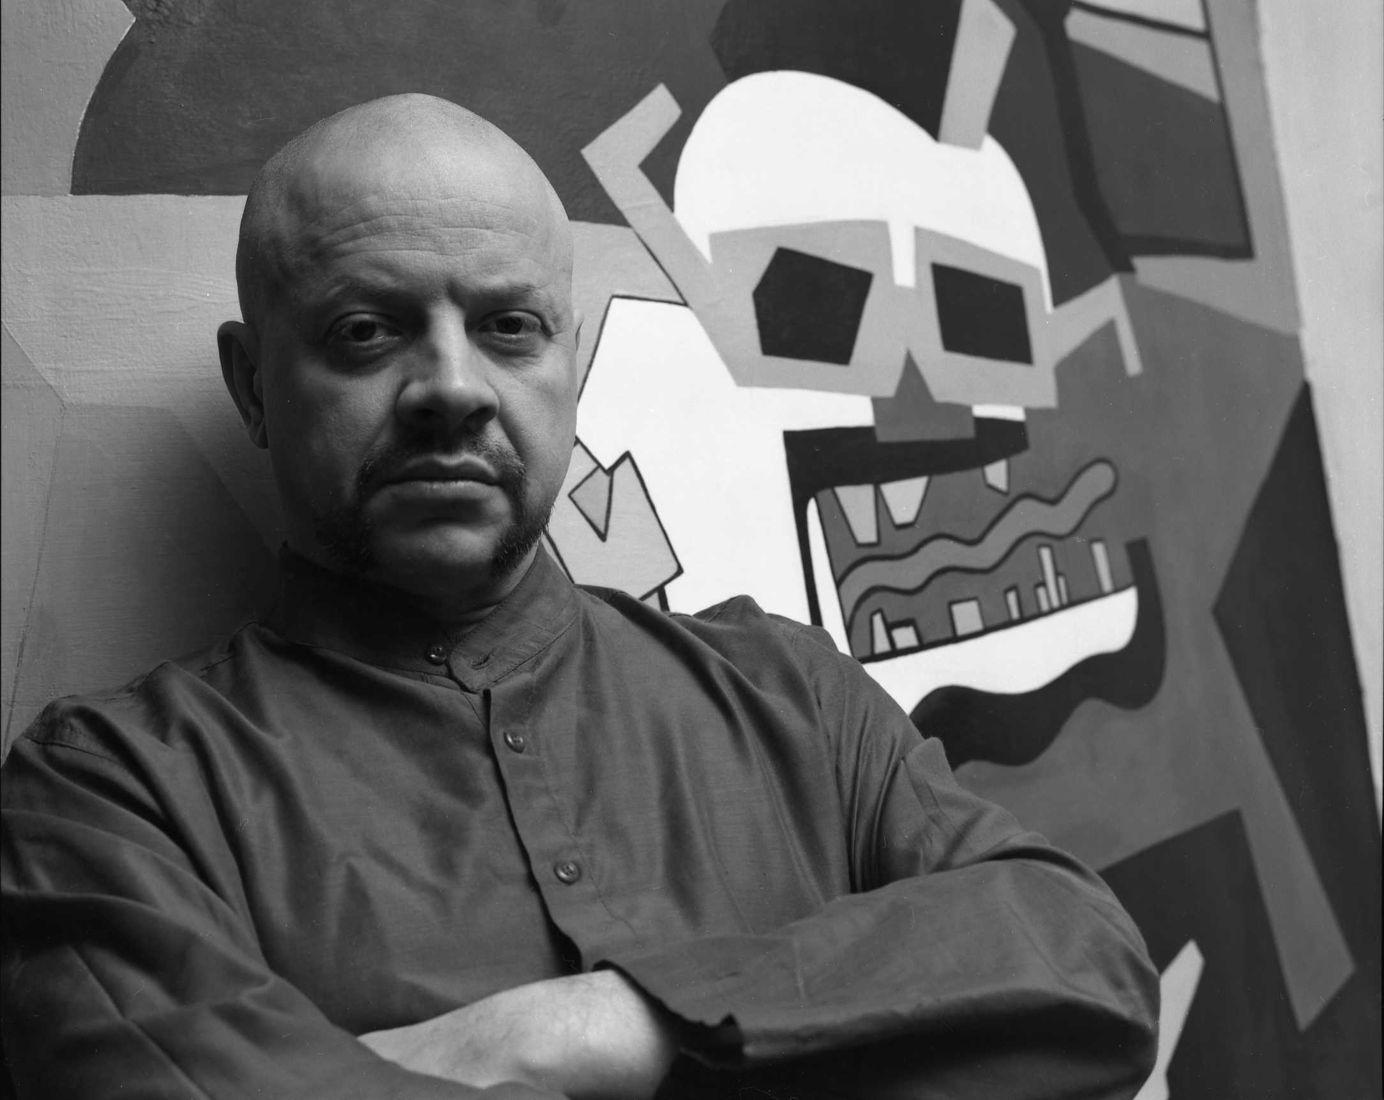 Сергей Борисов. portrait. олег шишкин. 2014.